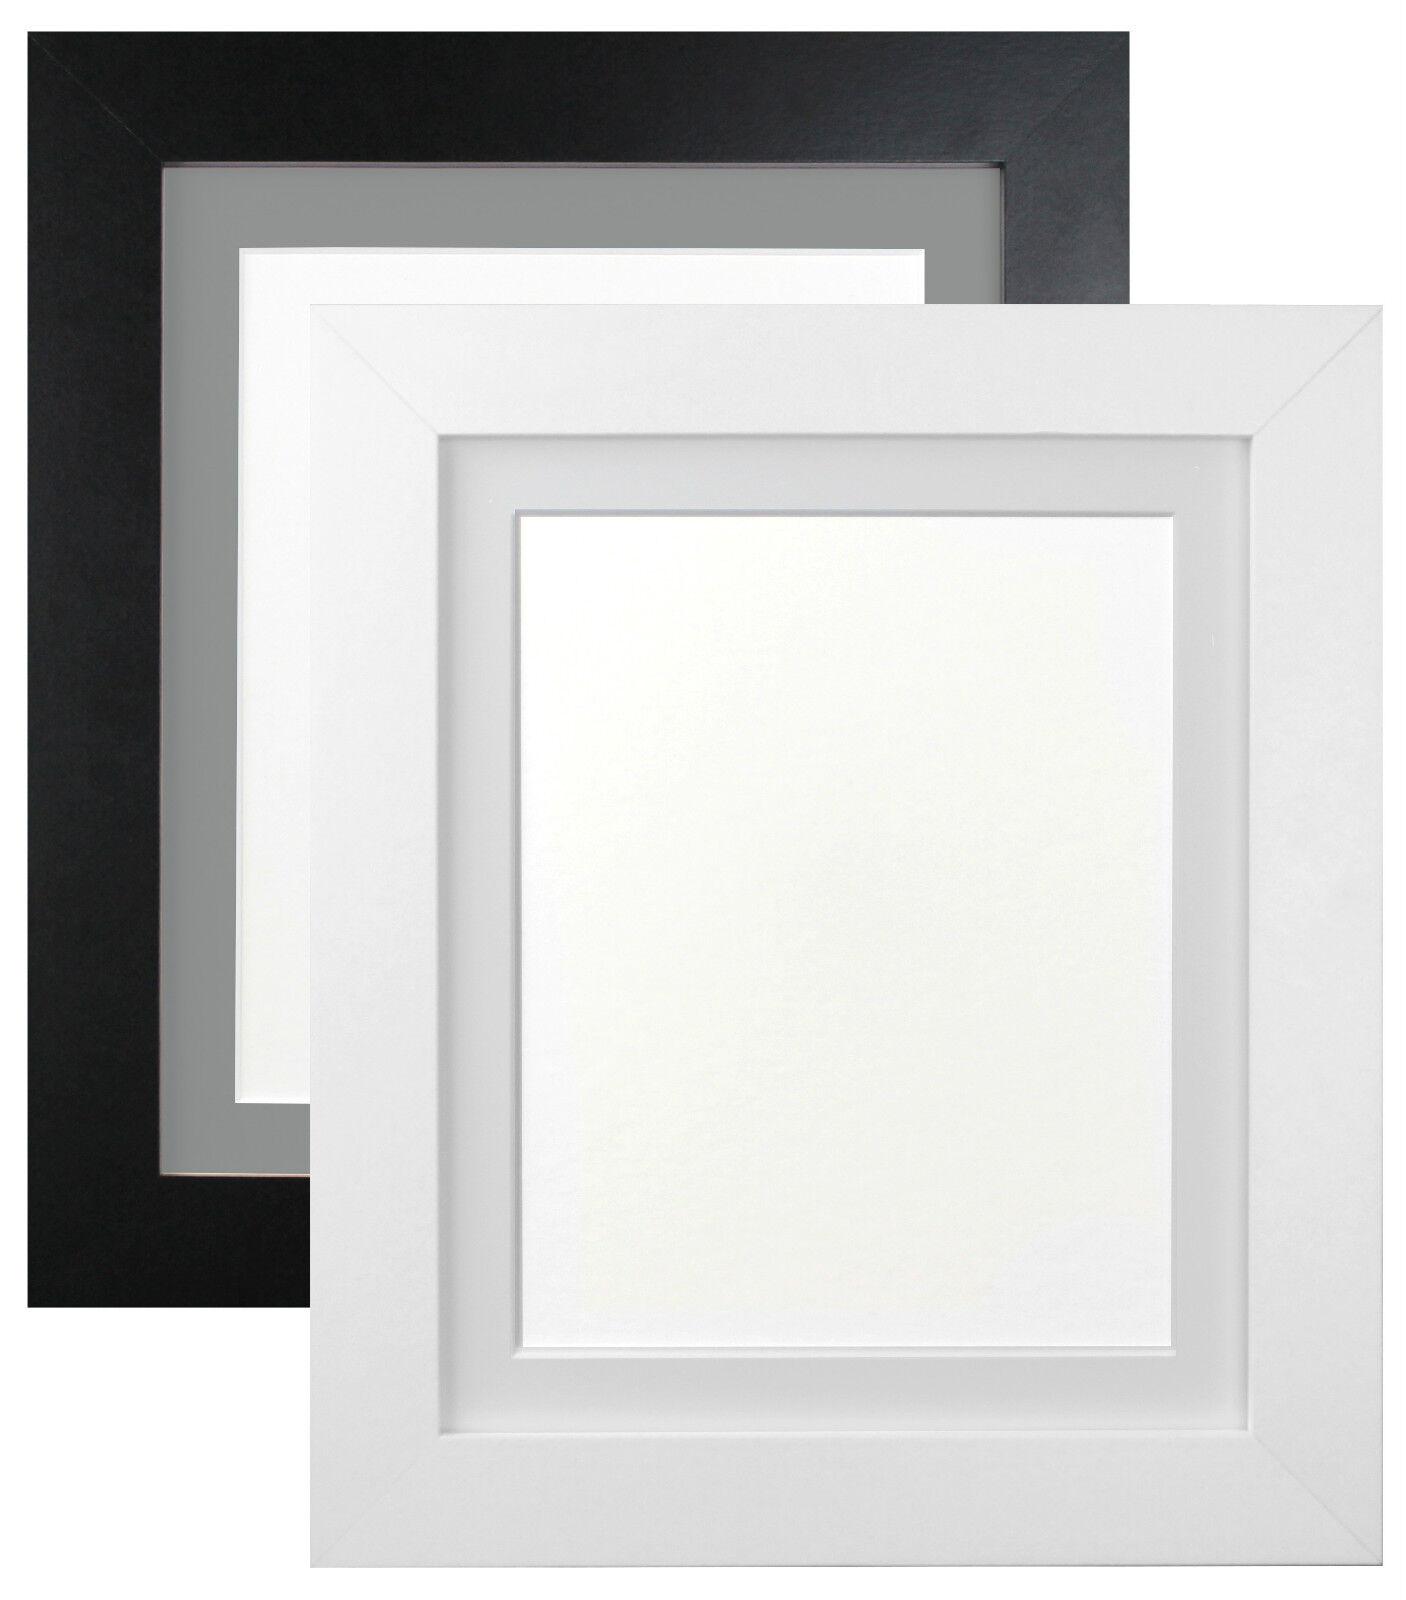 metro white black quality photo picture frames with dark or light grey mounts - Metro Frames